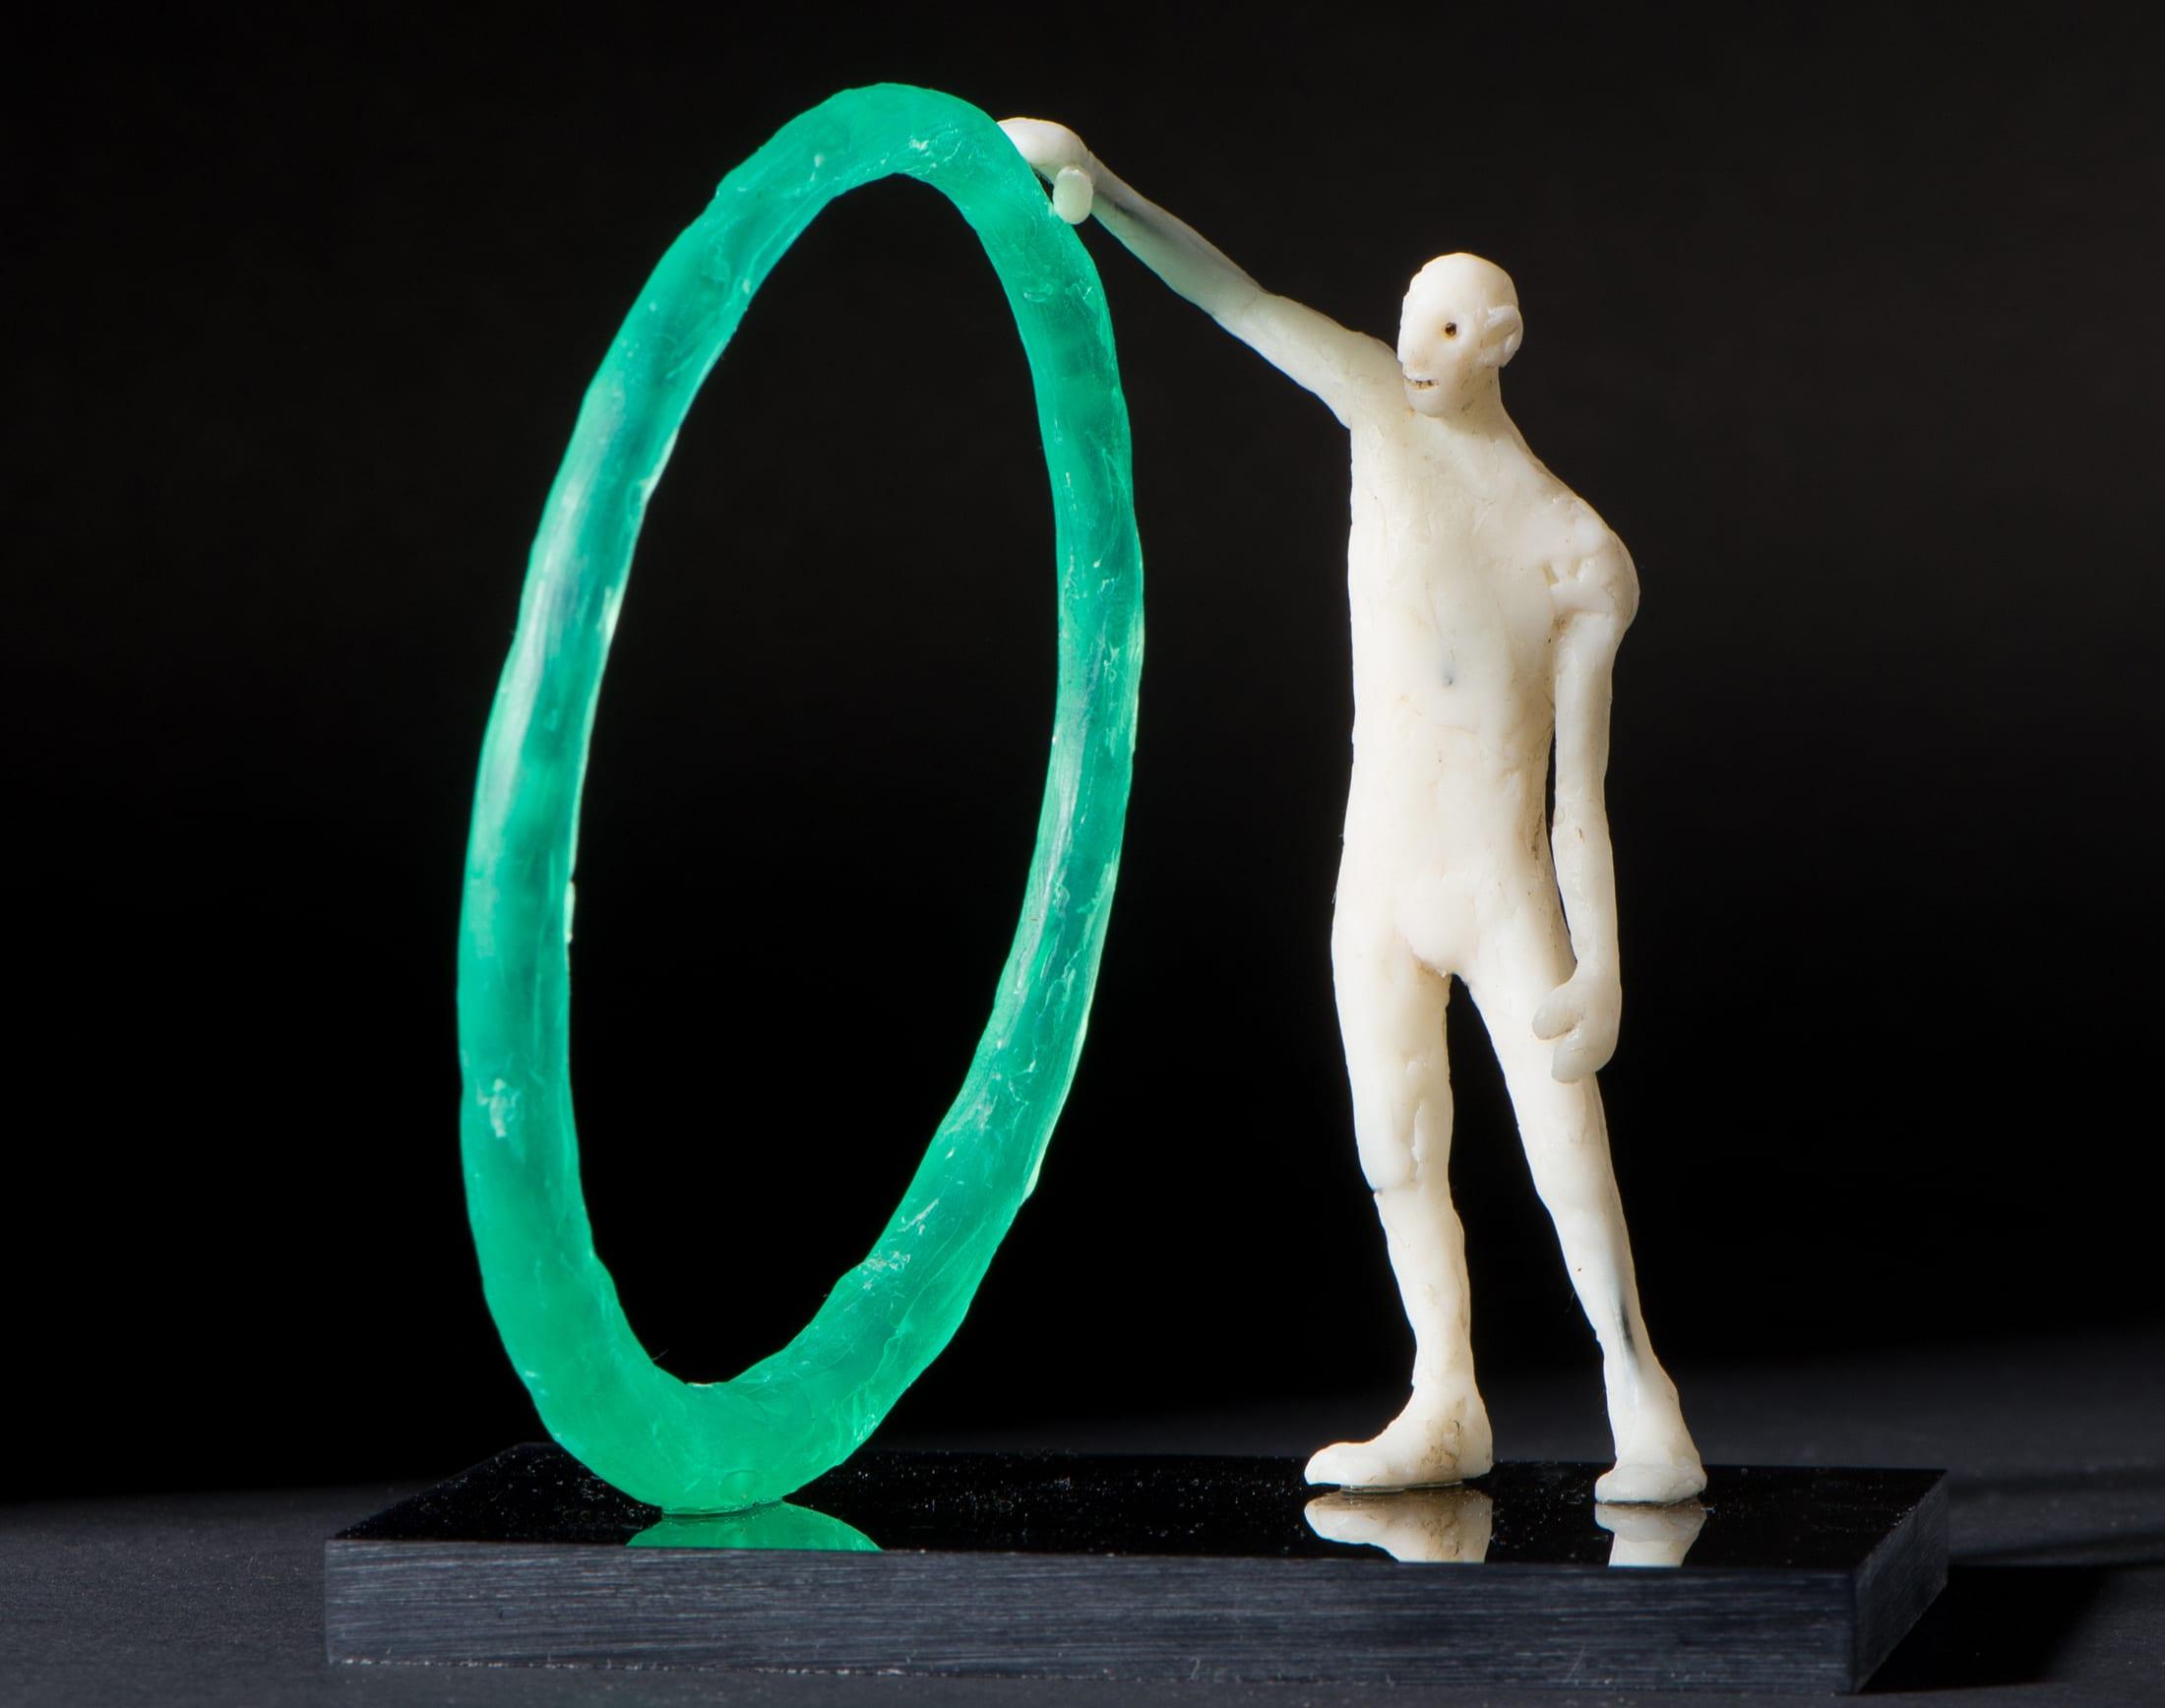 O Man sculpture